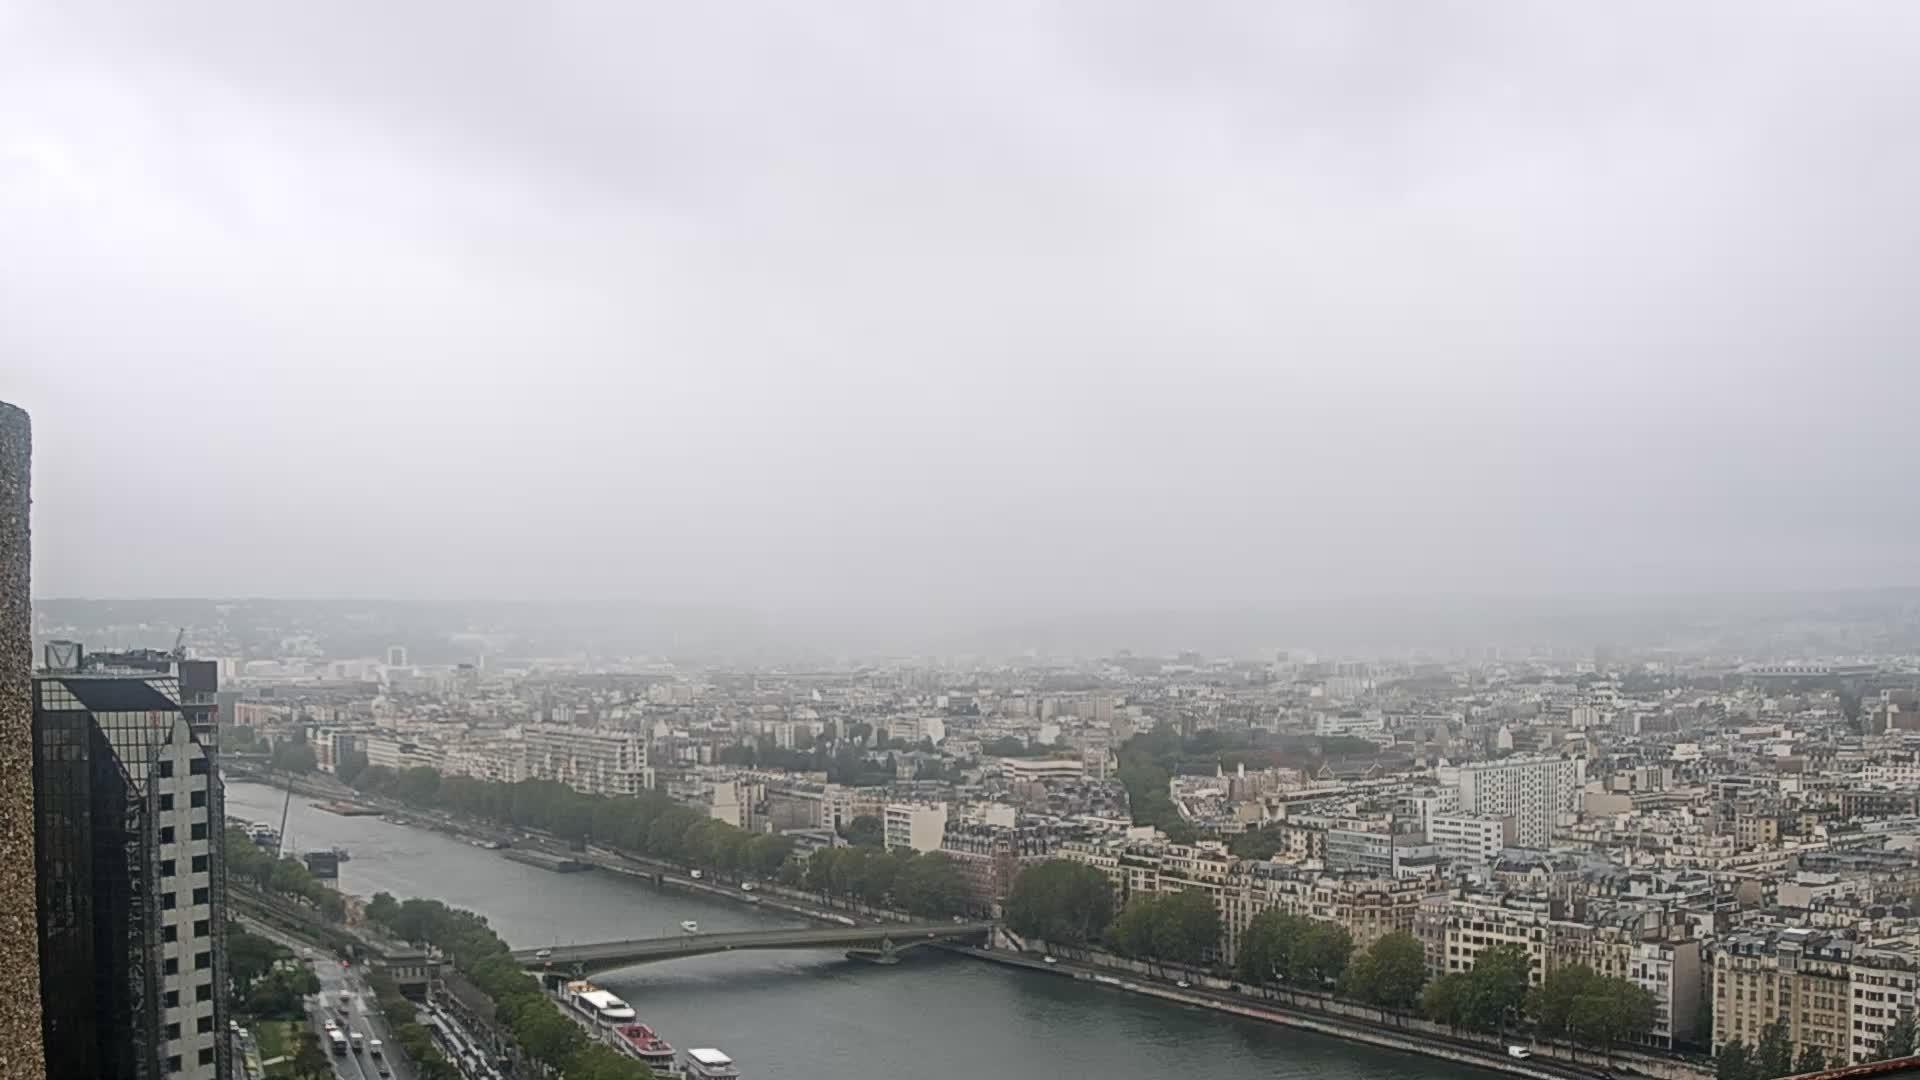 Parigi Gio. 09:24